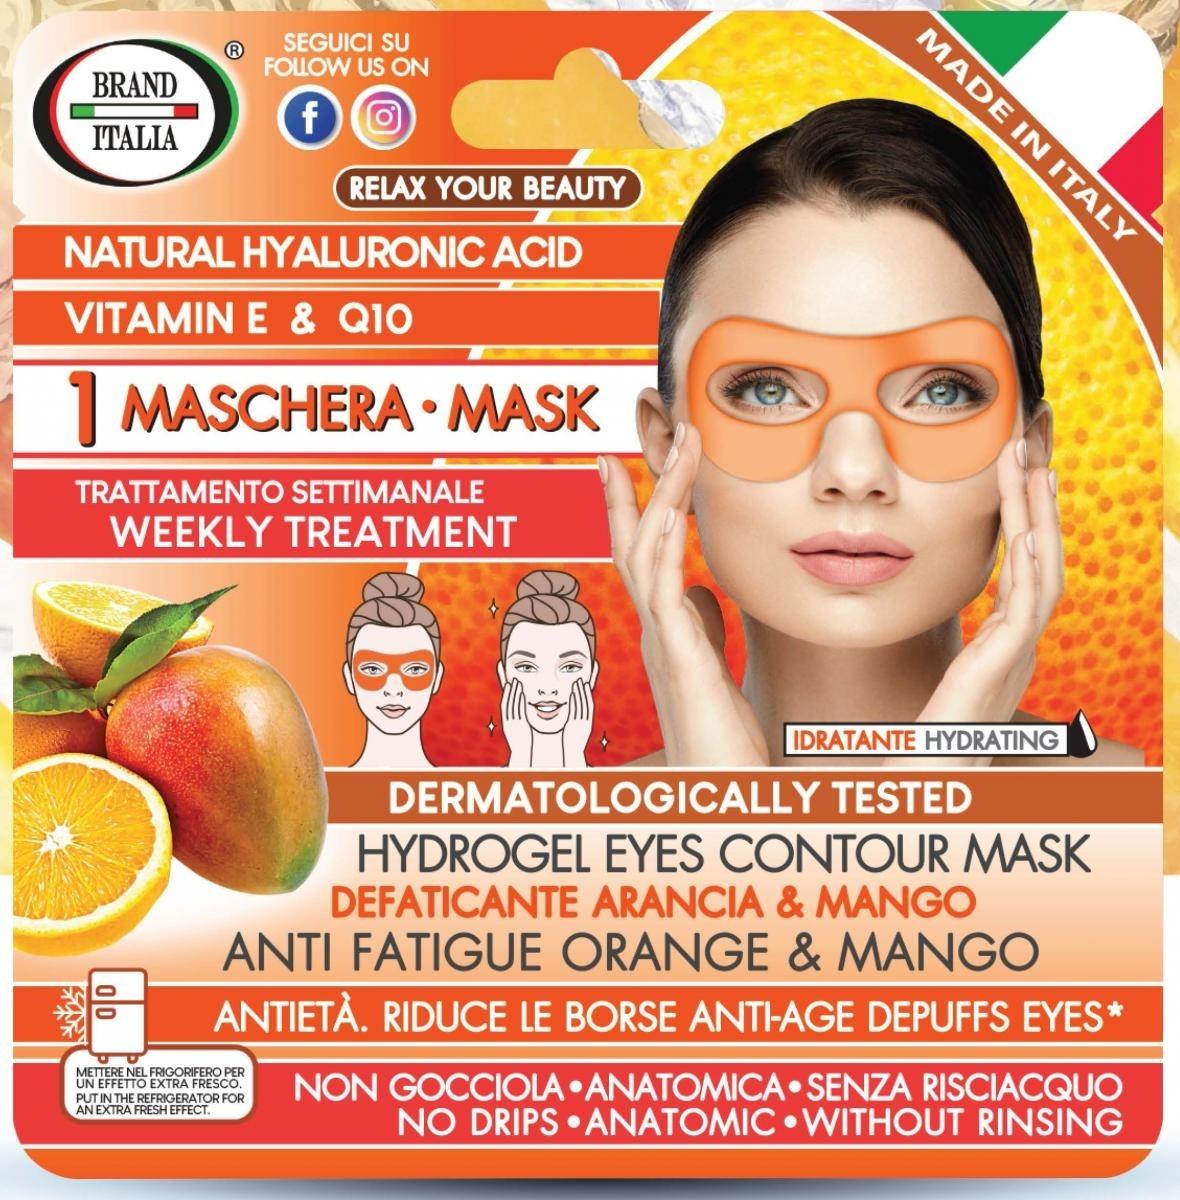 Maschera Antietà Defaticante Arancia e Mango